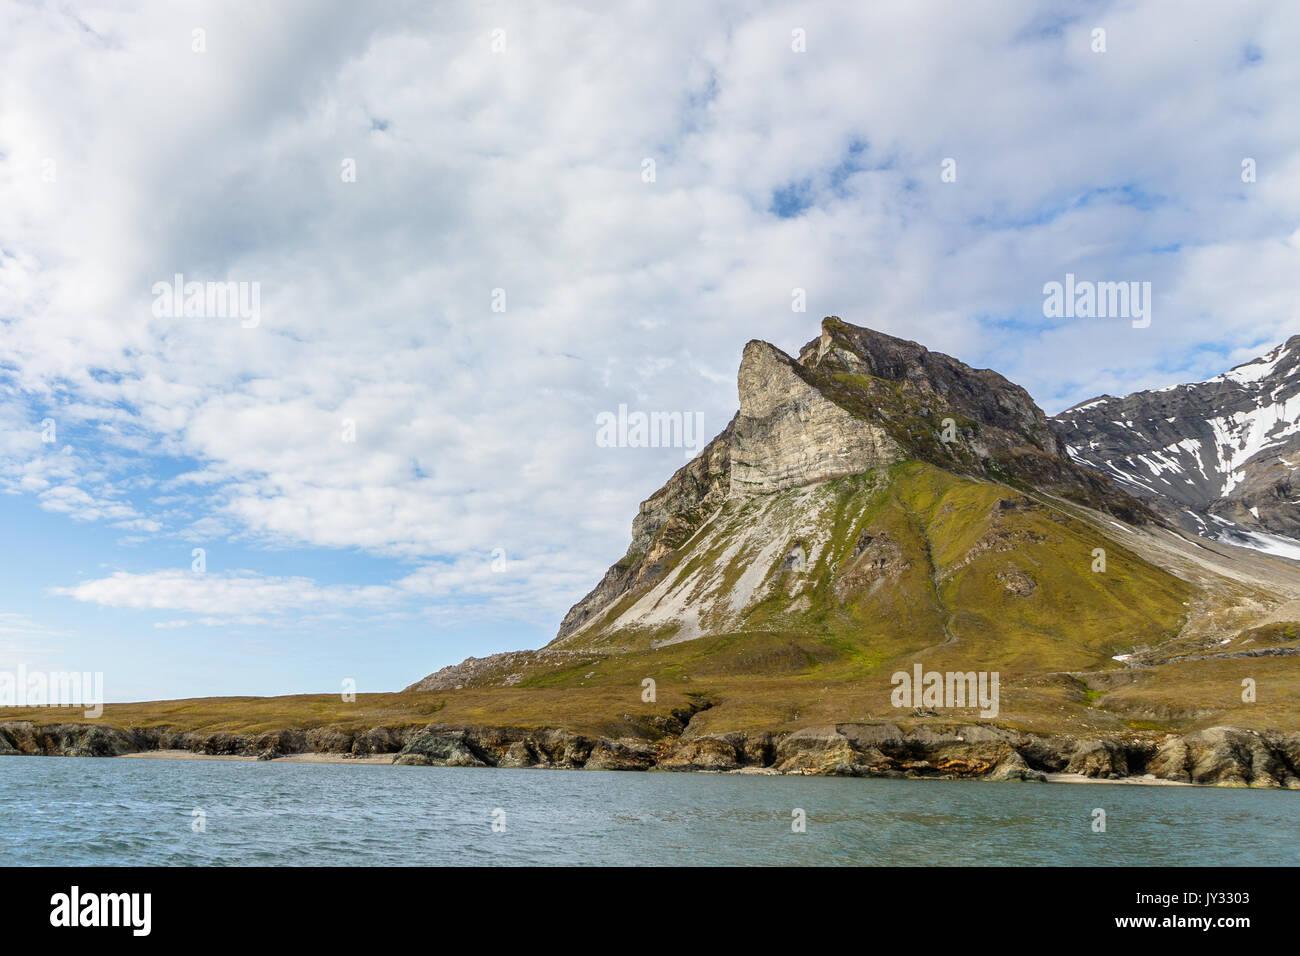 Alkehornet aka Alkhornet aka Alkepynten, bird mountain in Svalbard, Norway Stock Photo